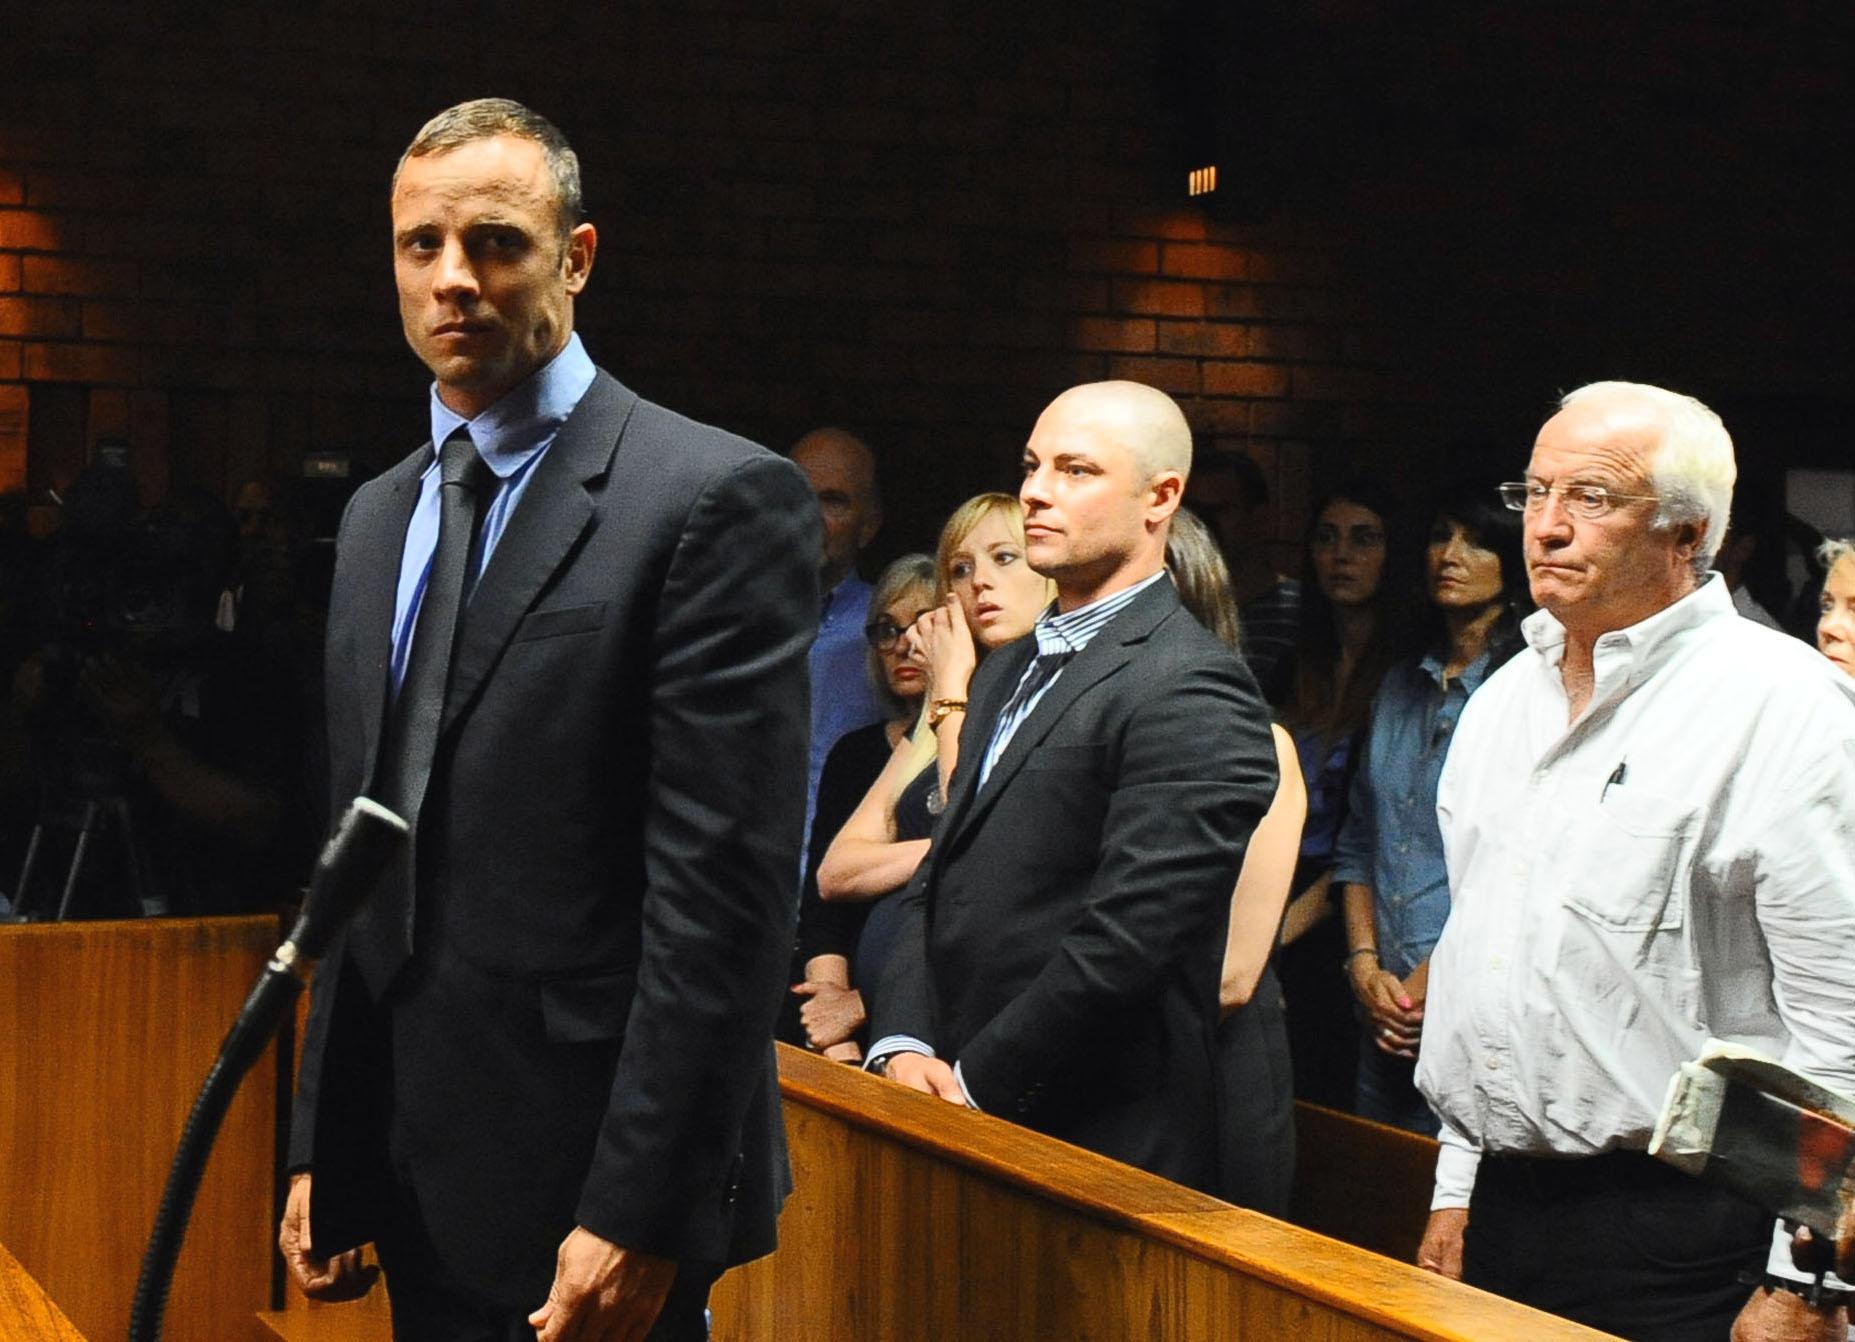 Oscar Pistorius satire